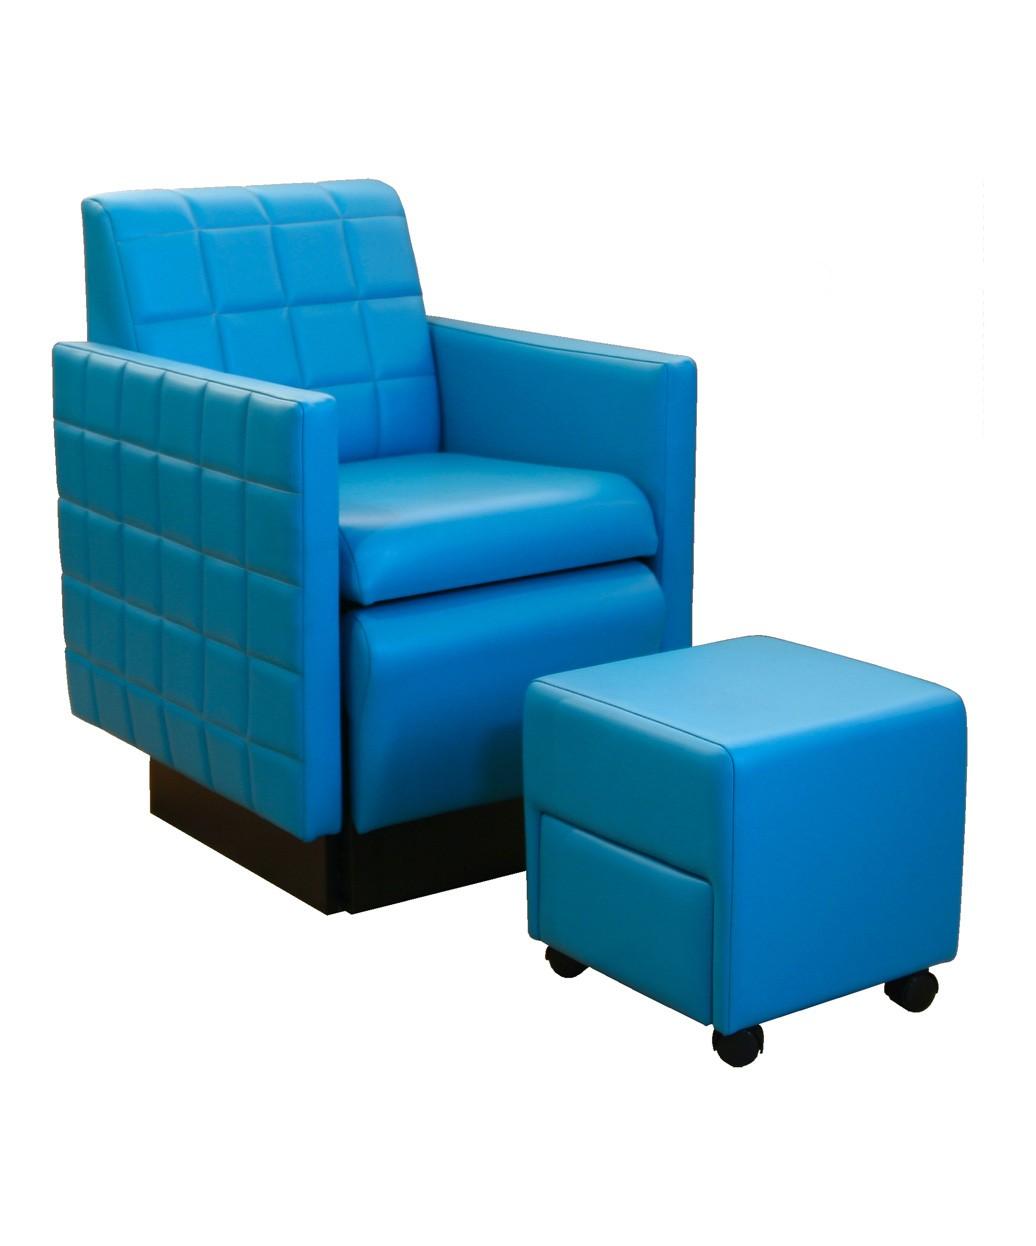 Collins 2560 Nouveau Club Pedicure Chair W Footsie Bath